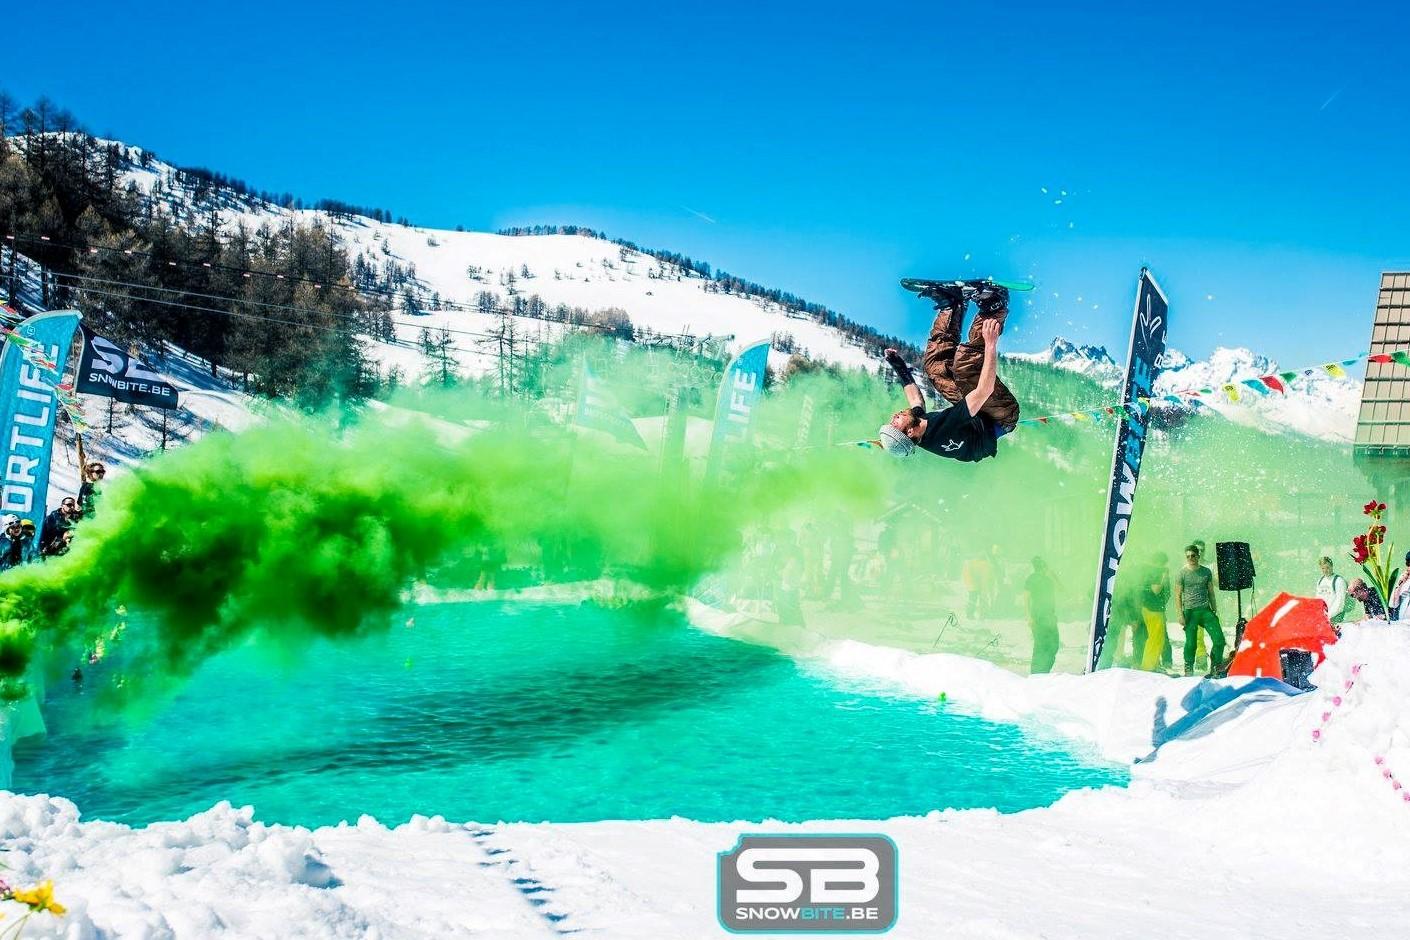 DREAM 2: SNOWCLASH WATERSLIDE #de natte droom van elke rider